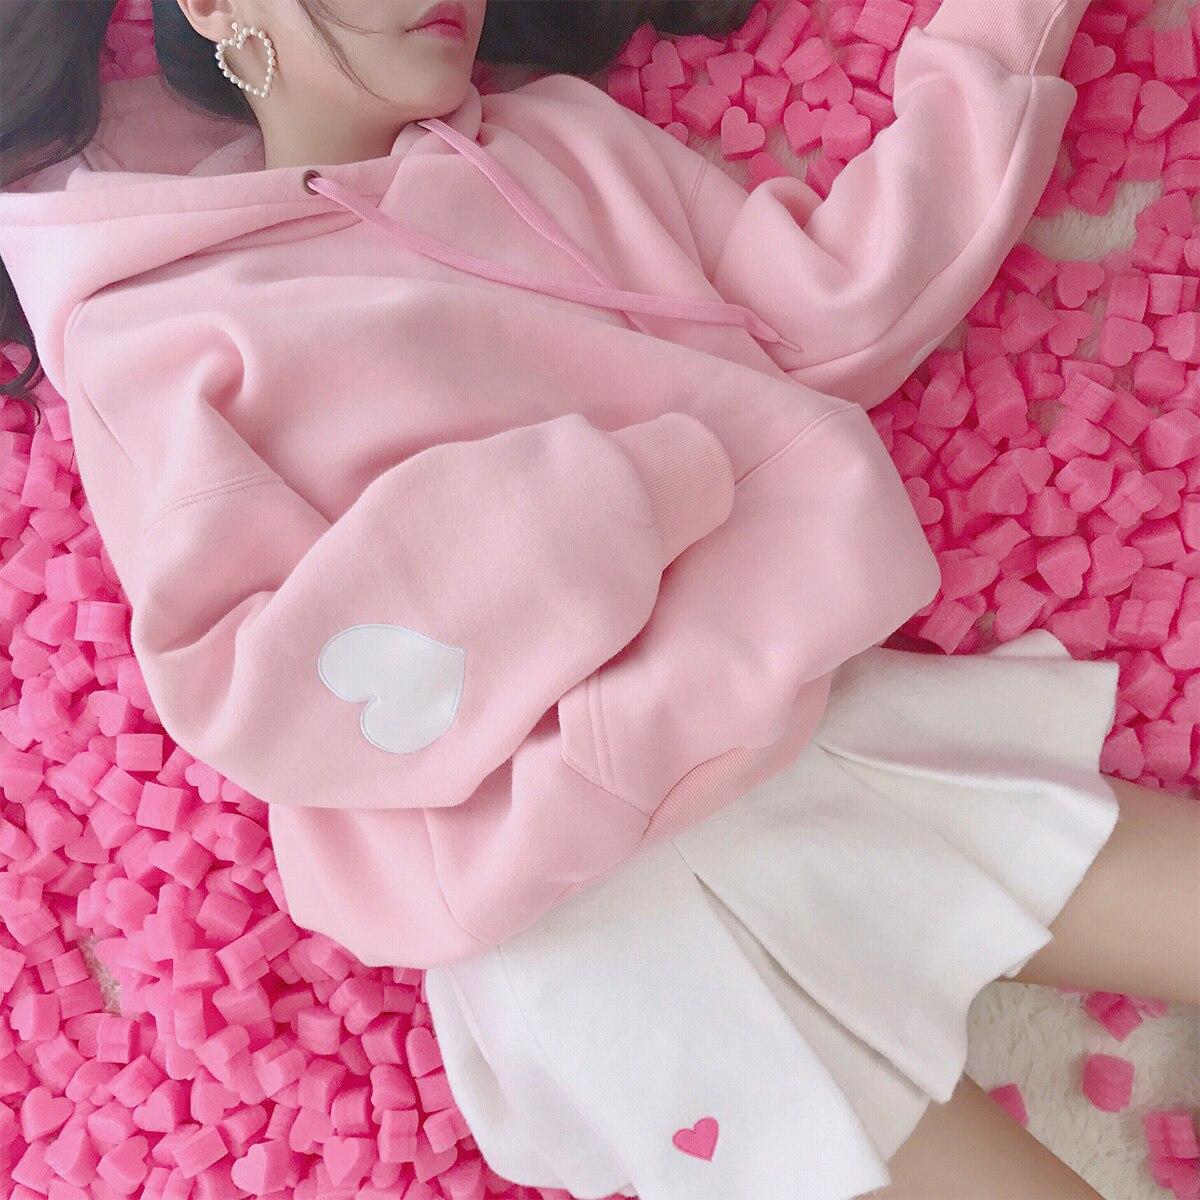 Japanese Streetwear Kawaii Sweet Love Hooded Sweatshirt Women Embroidery Hoodies Cute Long Sleeve Tracksuits Pullovers Moletom